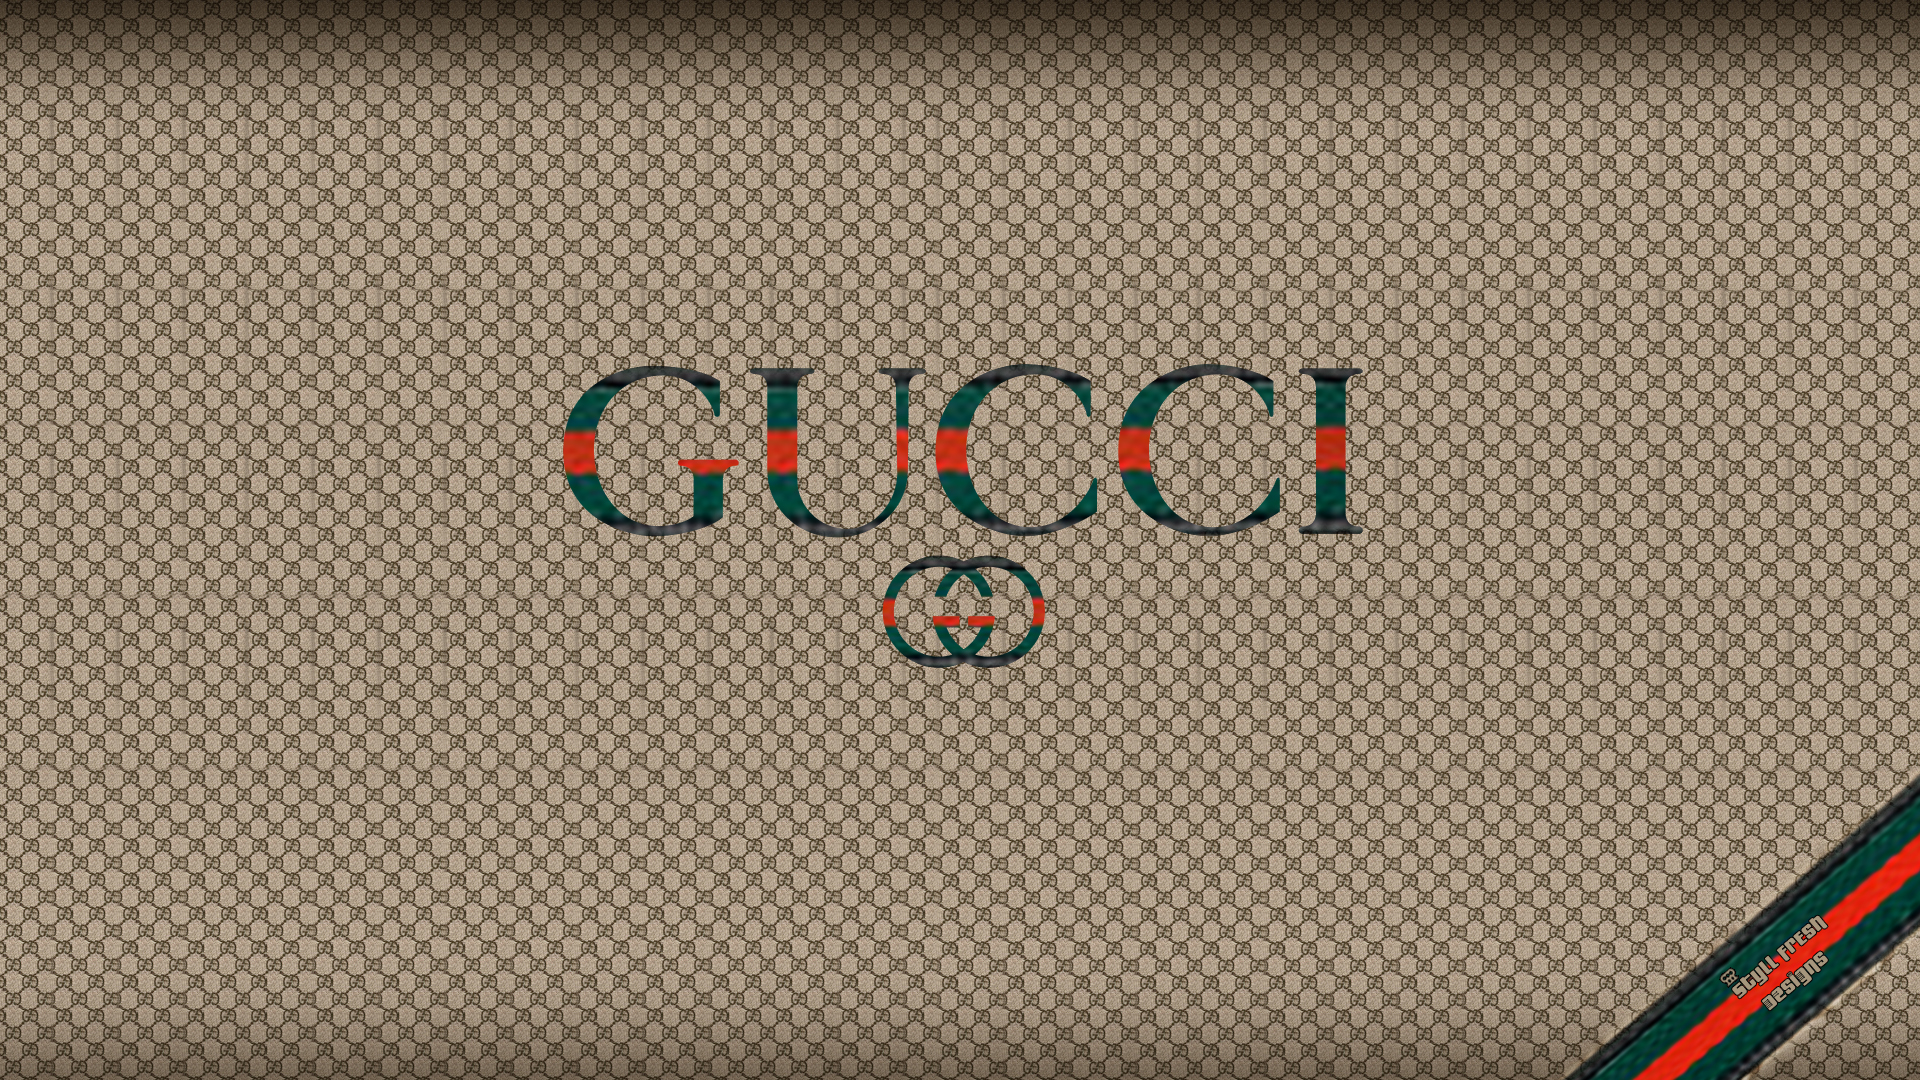 Gucci Logo Wallpaper   HD Wallpapers 1920x1080